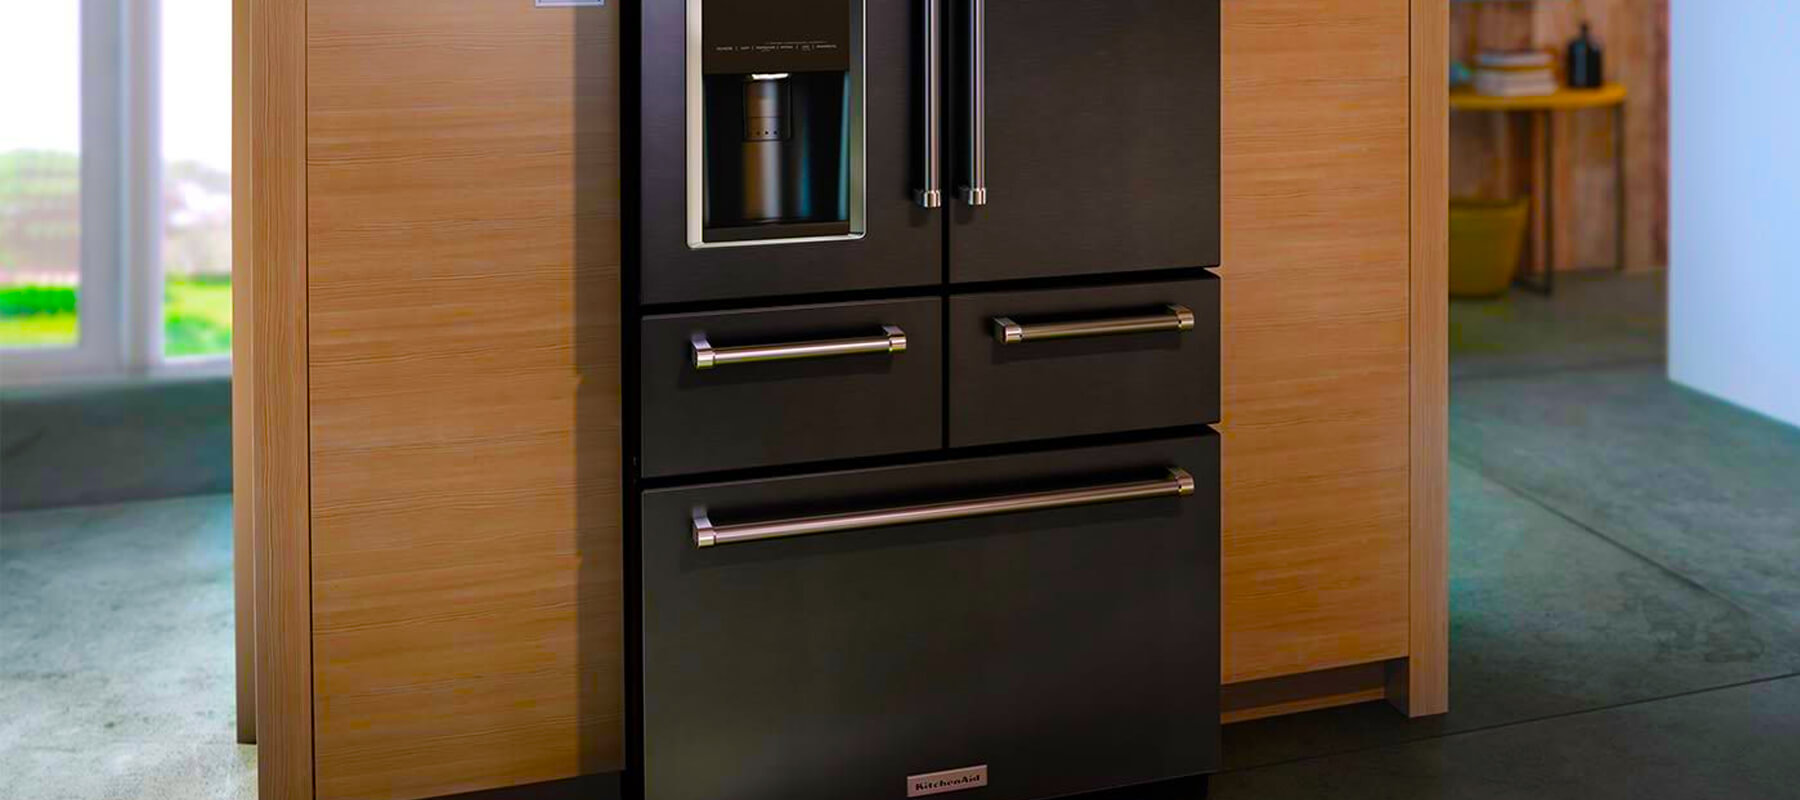 Kitchenaid Built in Refrigerator Problems | Built-in Refrigerator Repair